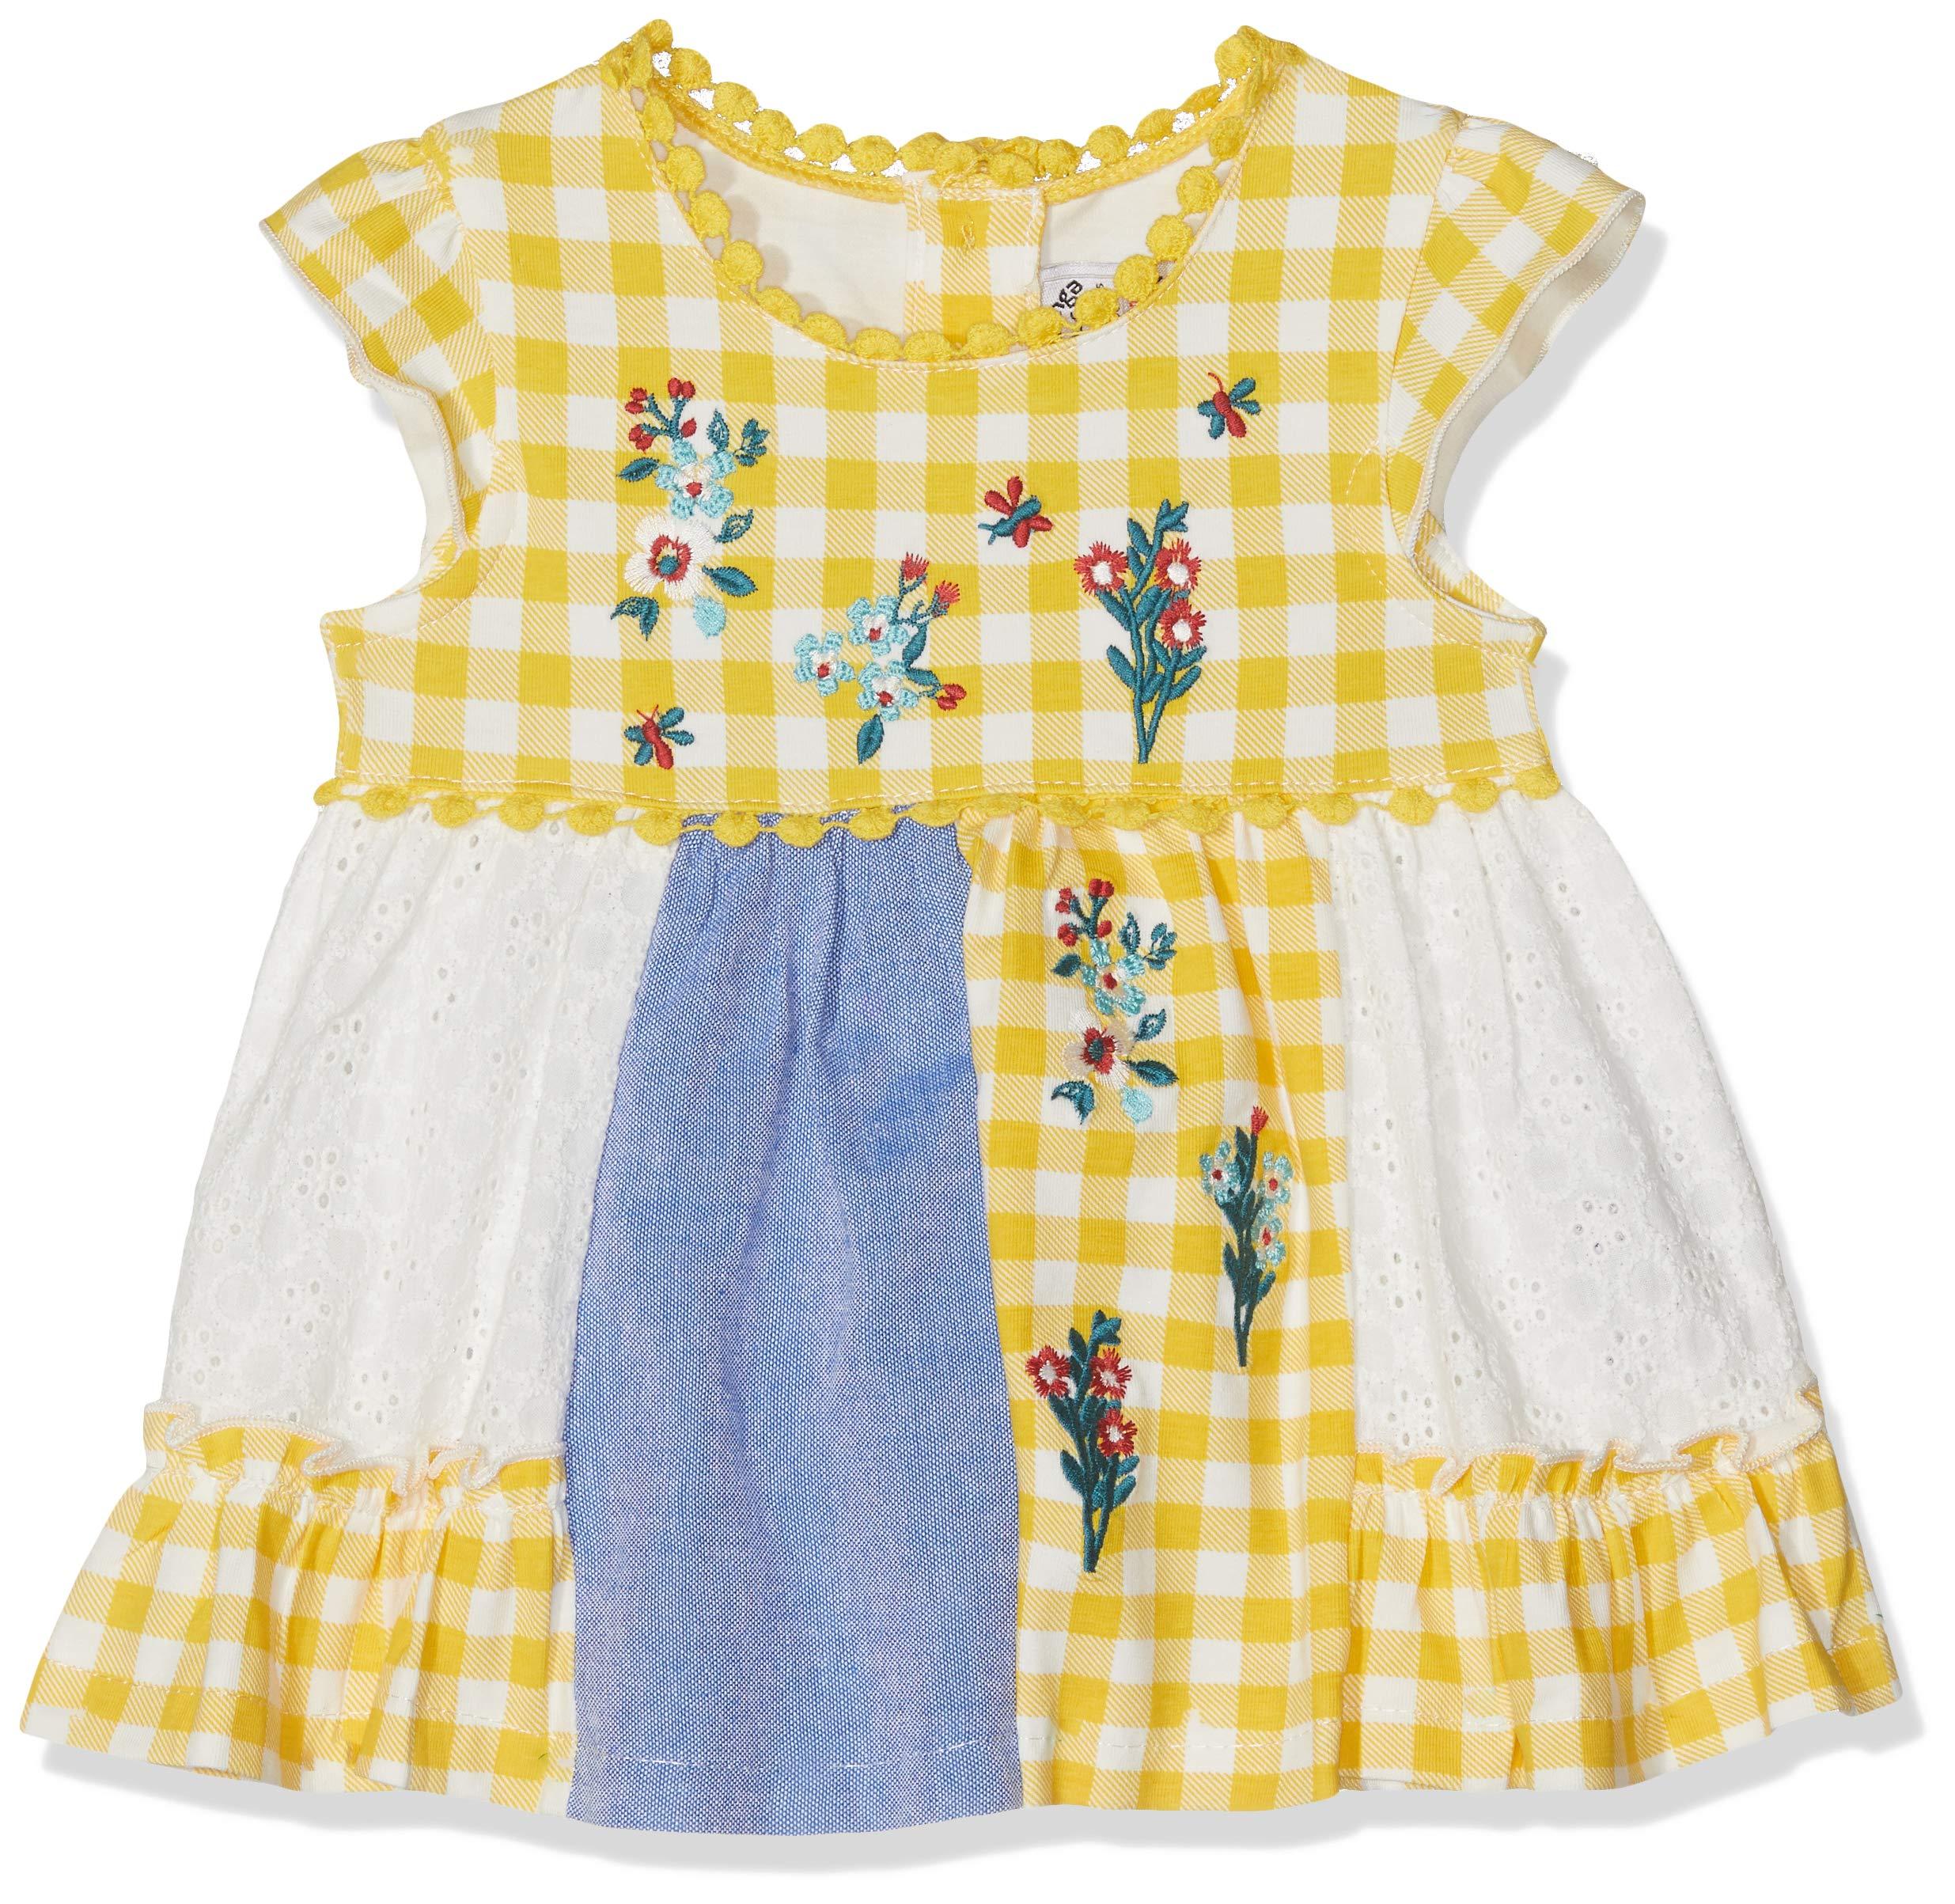 Charanga  vrurales Vestido para Bebés 1